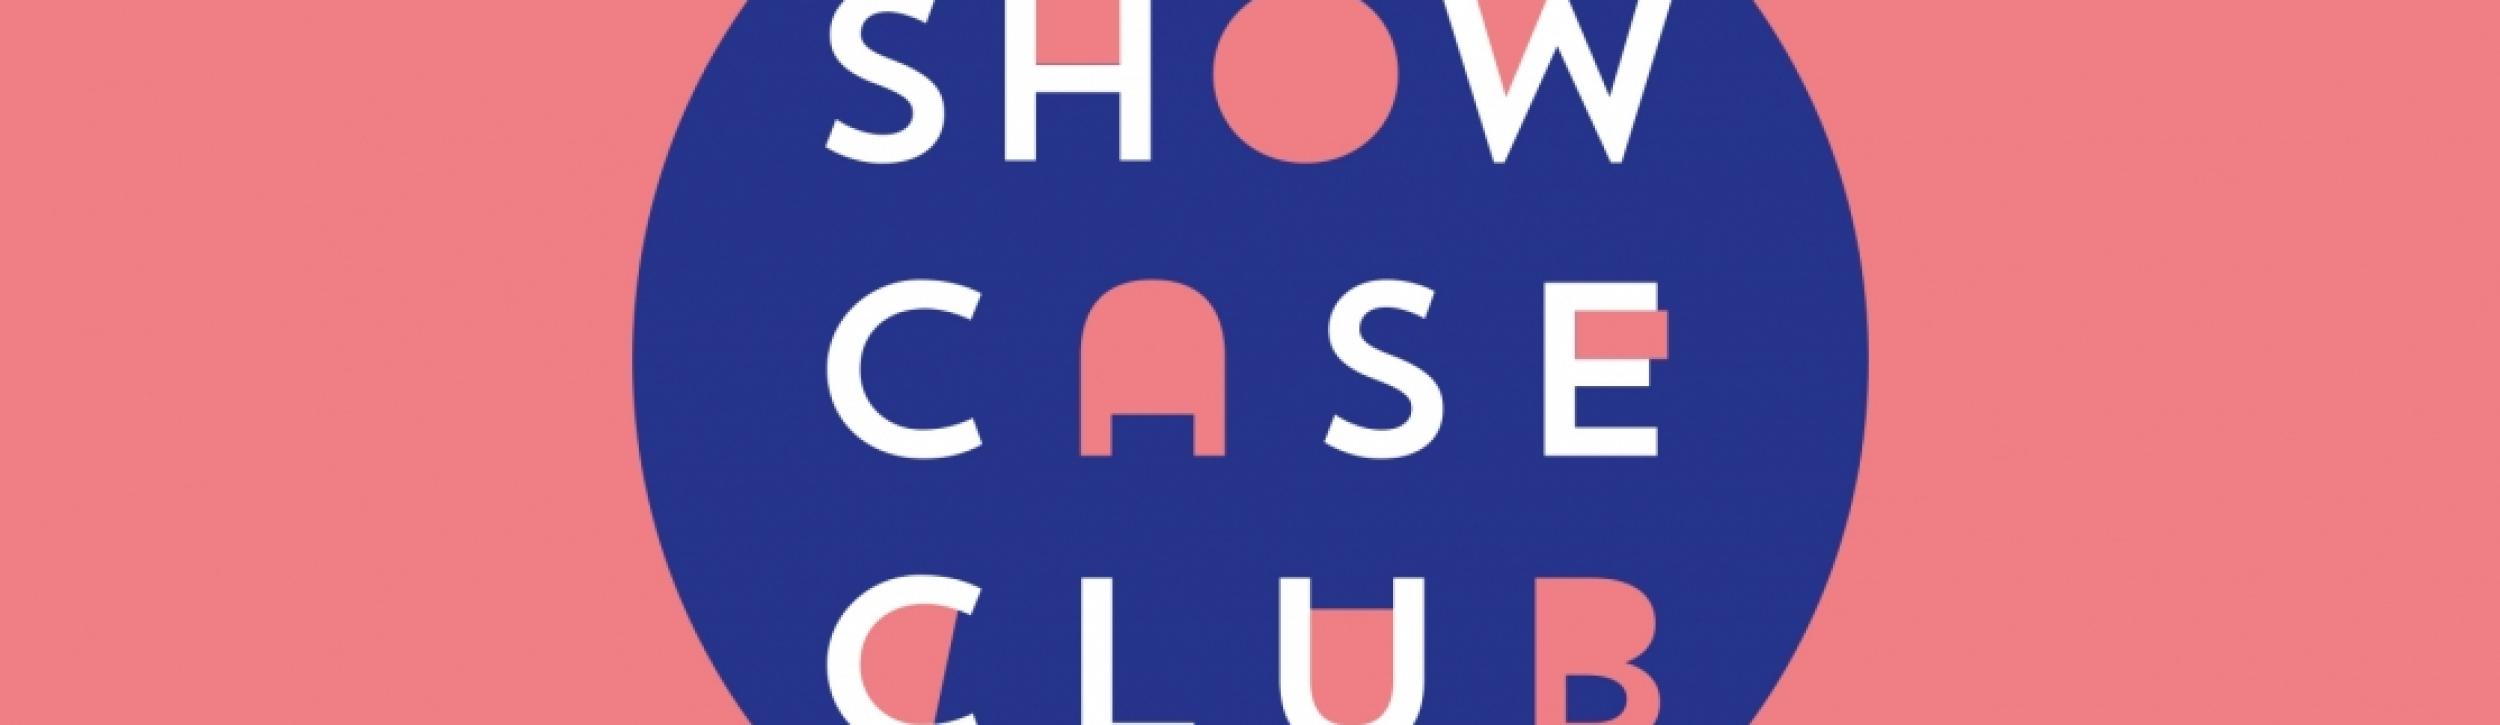 Show Case Club